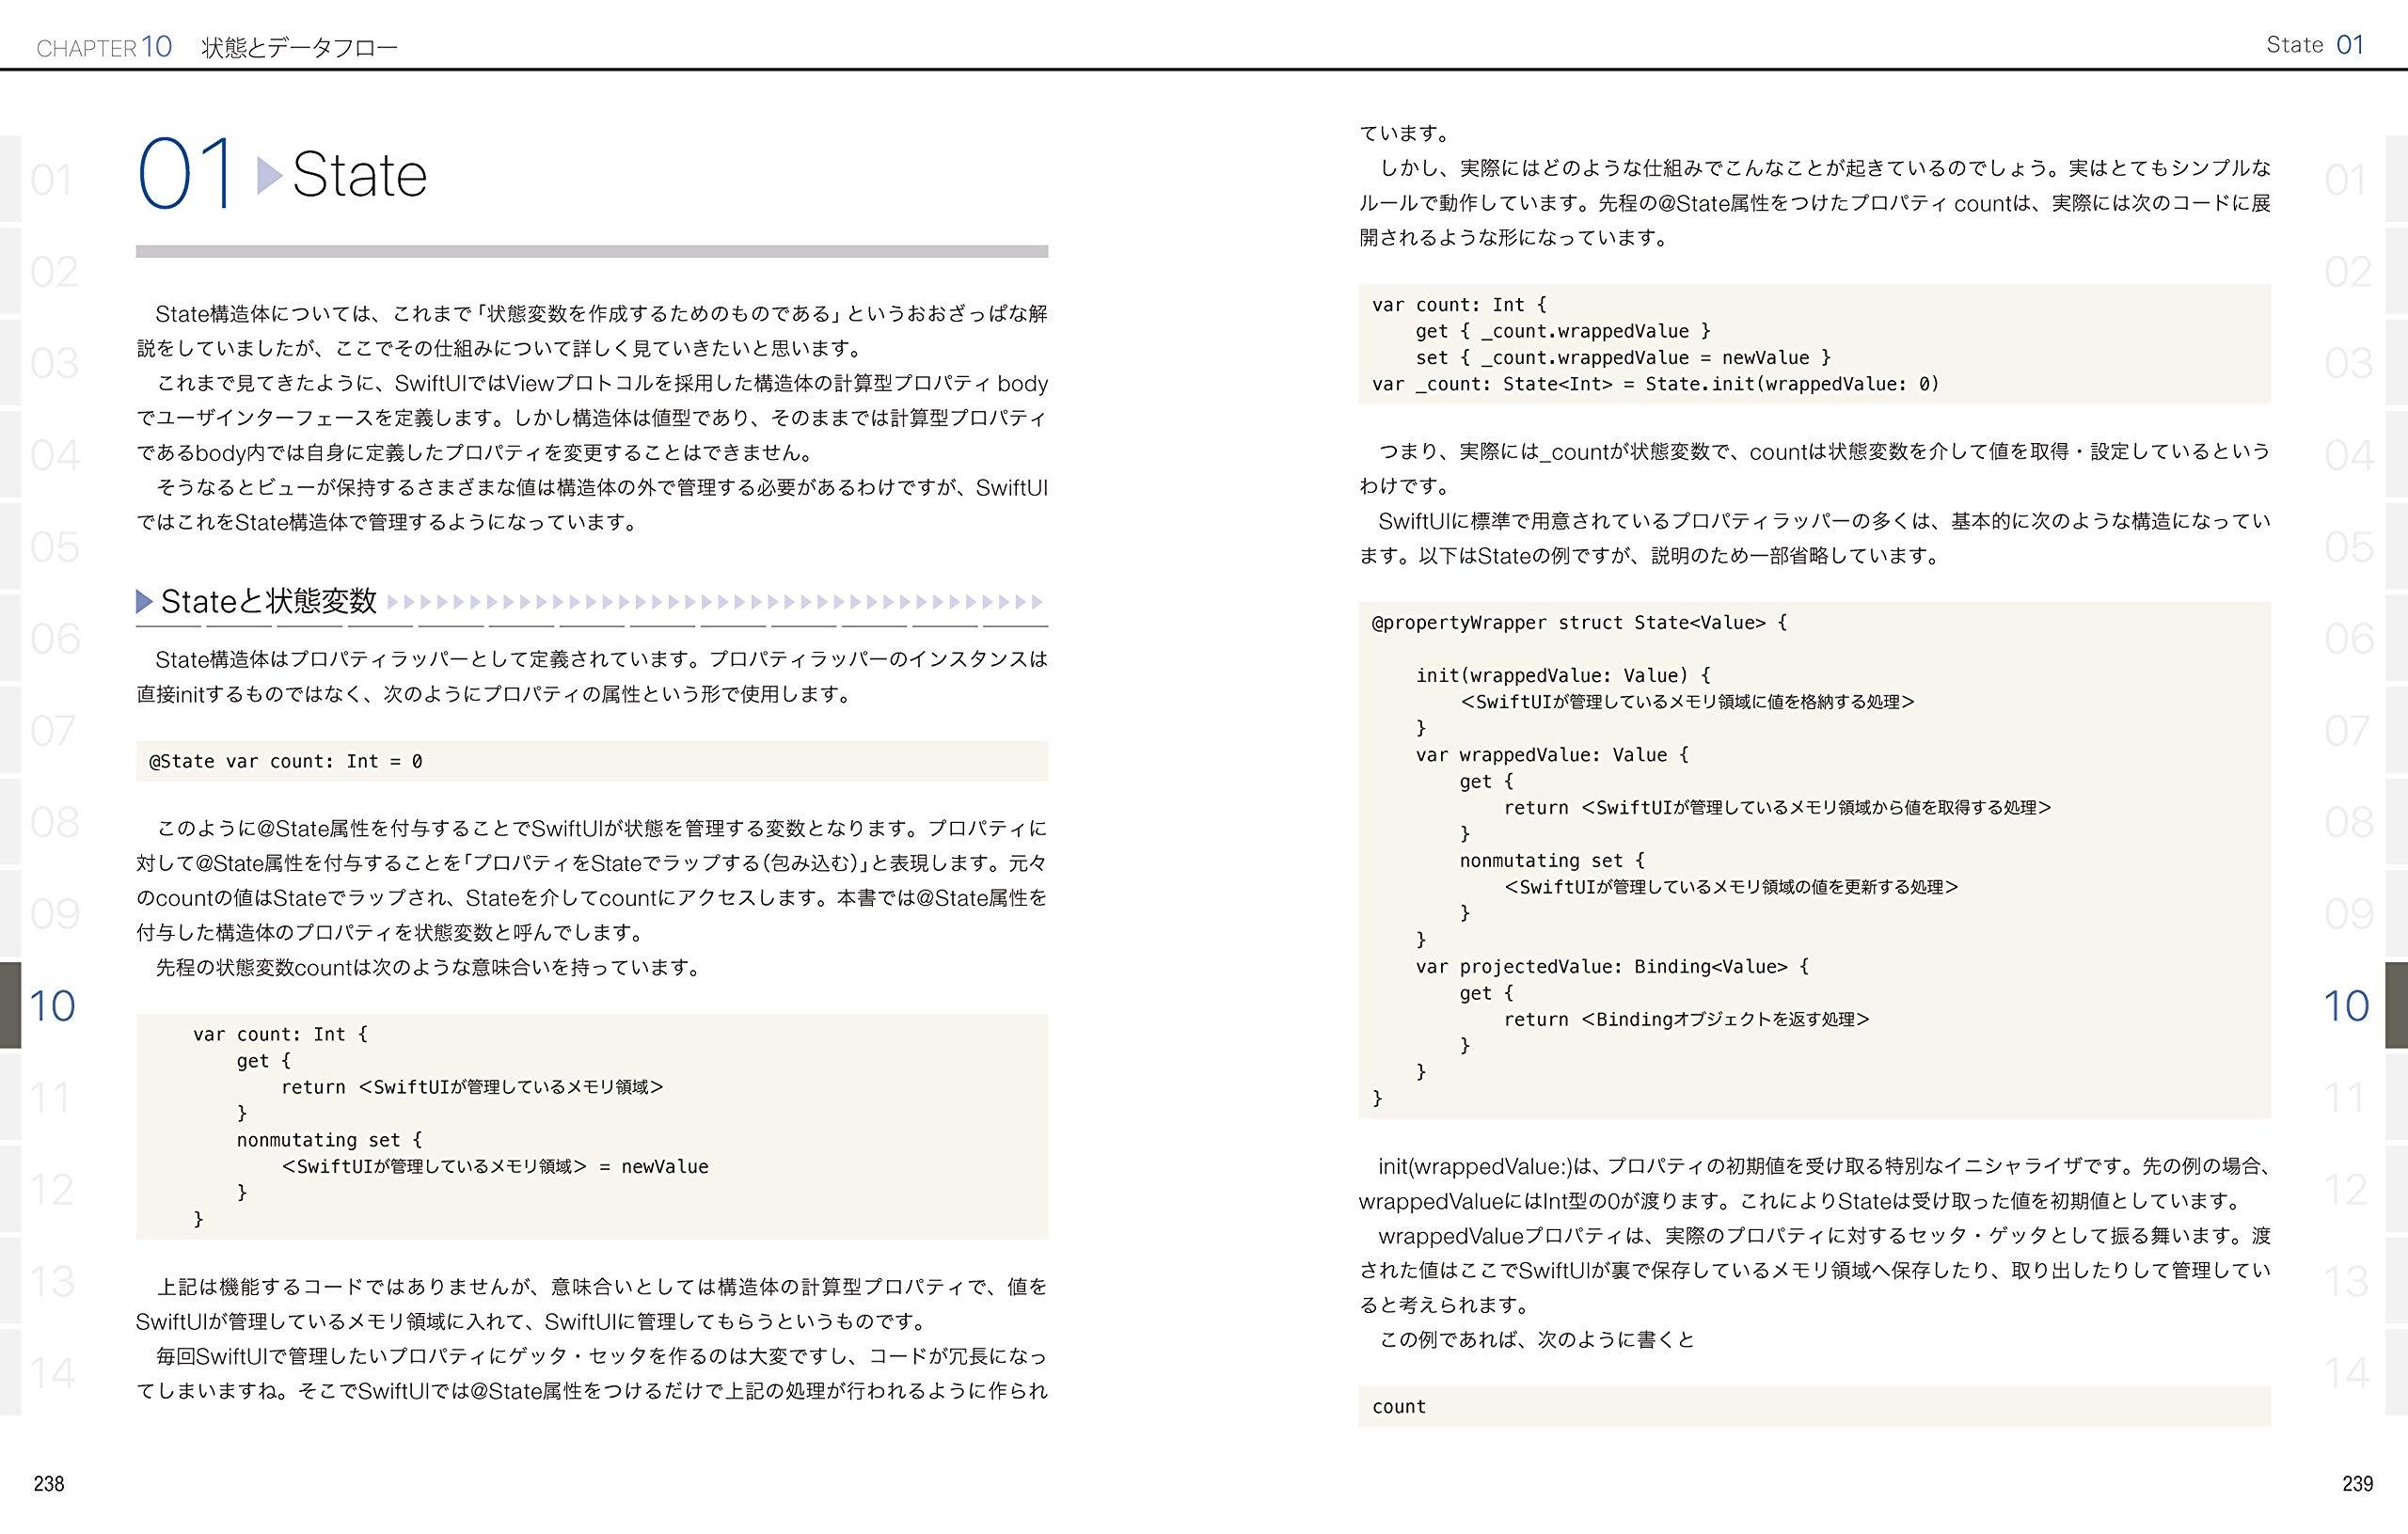 Thumbnail of SwiftUI 徹底入門5$